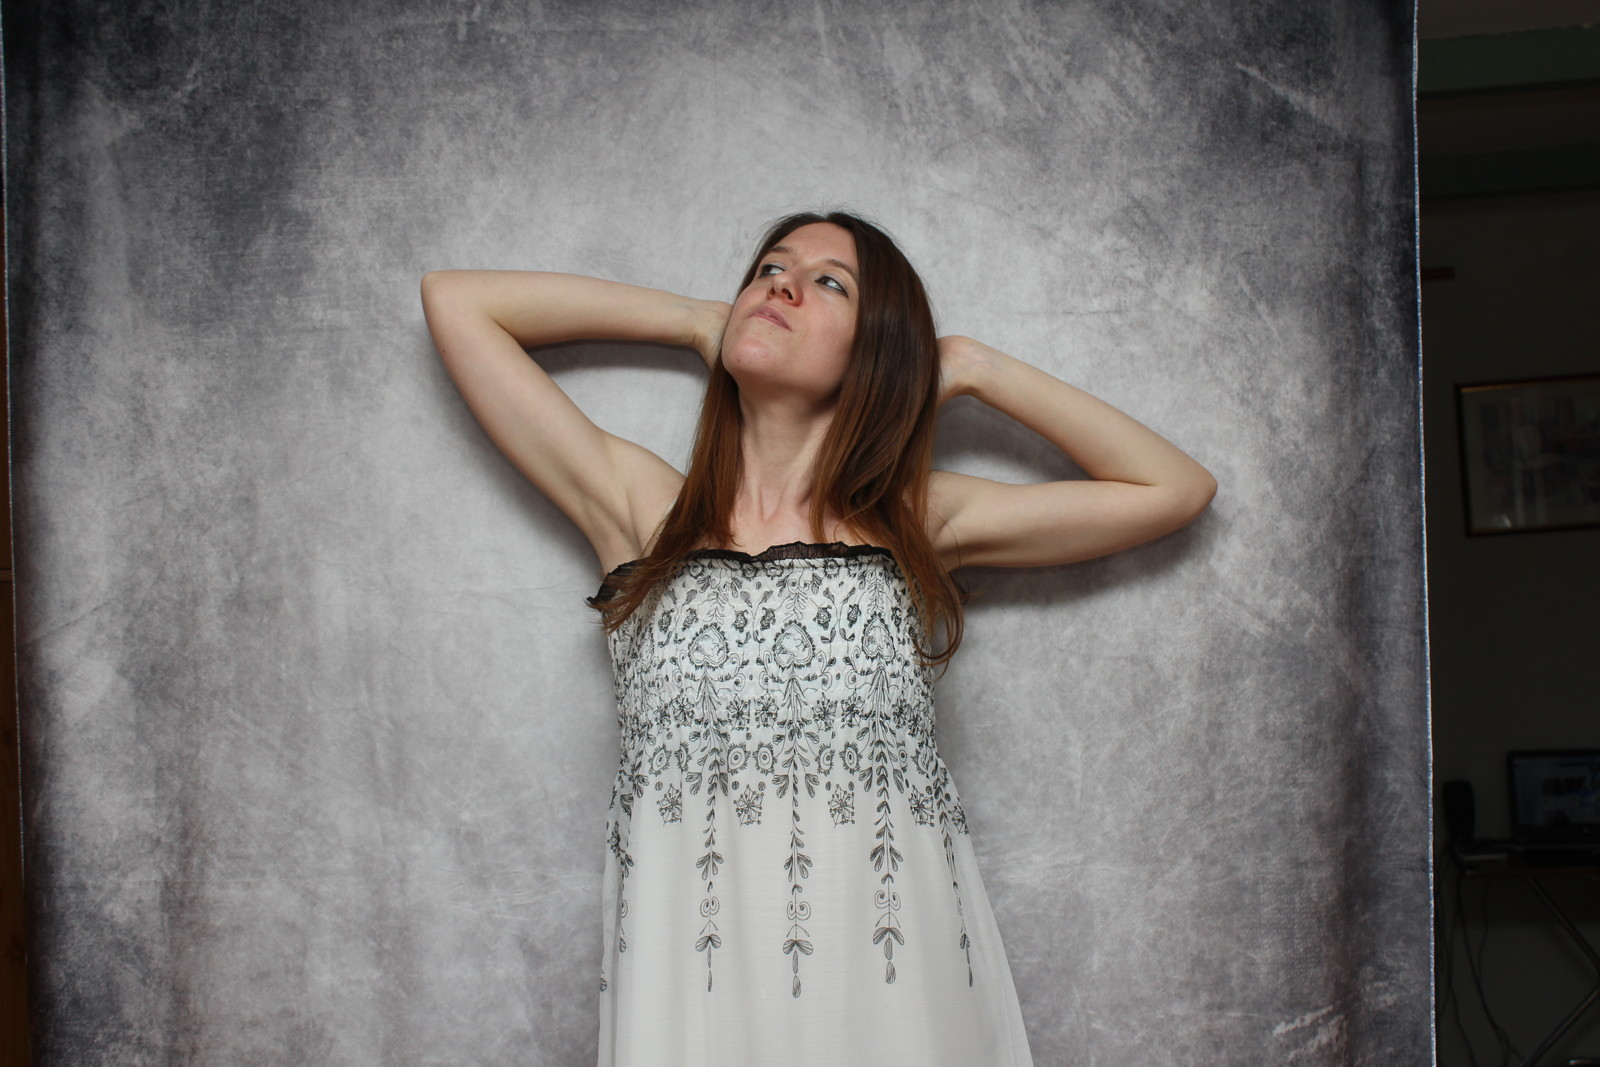 Shoot Habiller Modele Photo Amatrice Modele Debutant De 26ans A Maclas